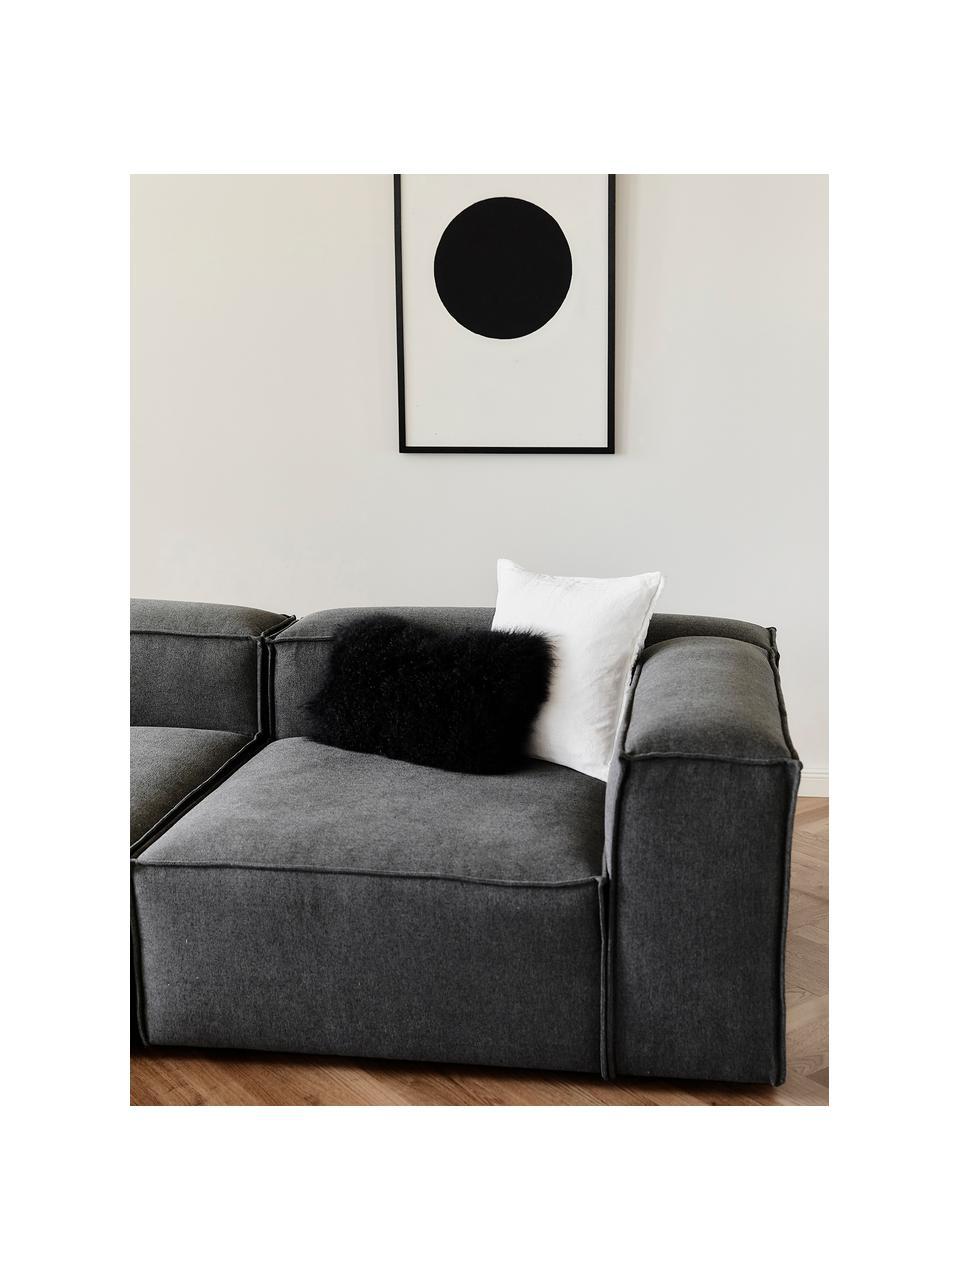 Modulaire chaise longue Lennon in antraciet, Bekleding: polyester De hoogwaardige, Frame: massief grenenhout, multi, Poten: kunststof De poten bevind, Geweven stof antraciet, B 269 x D 119 cm